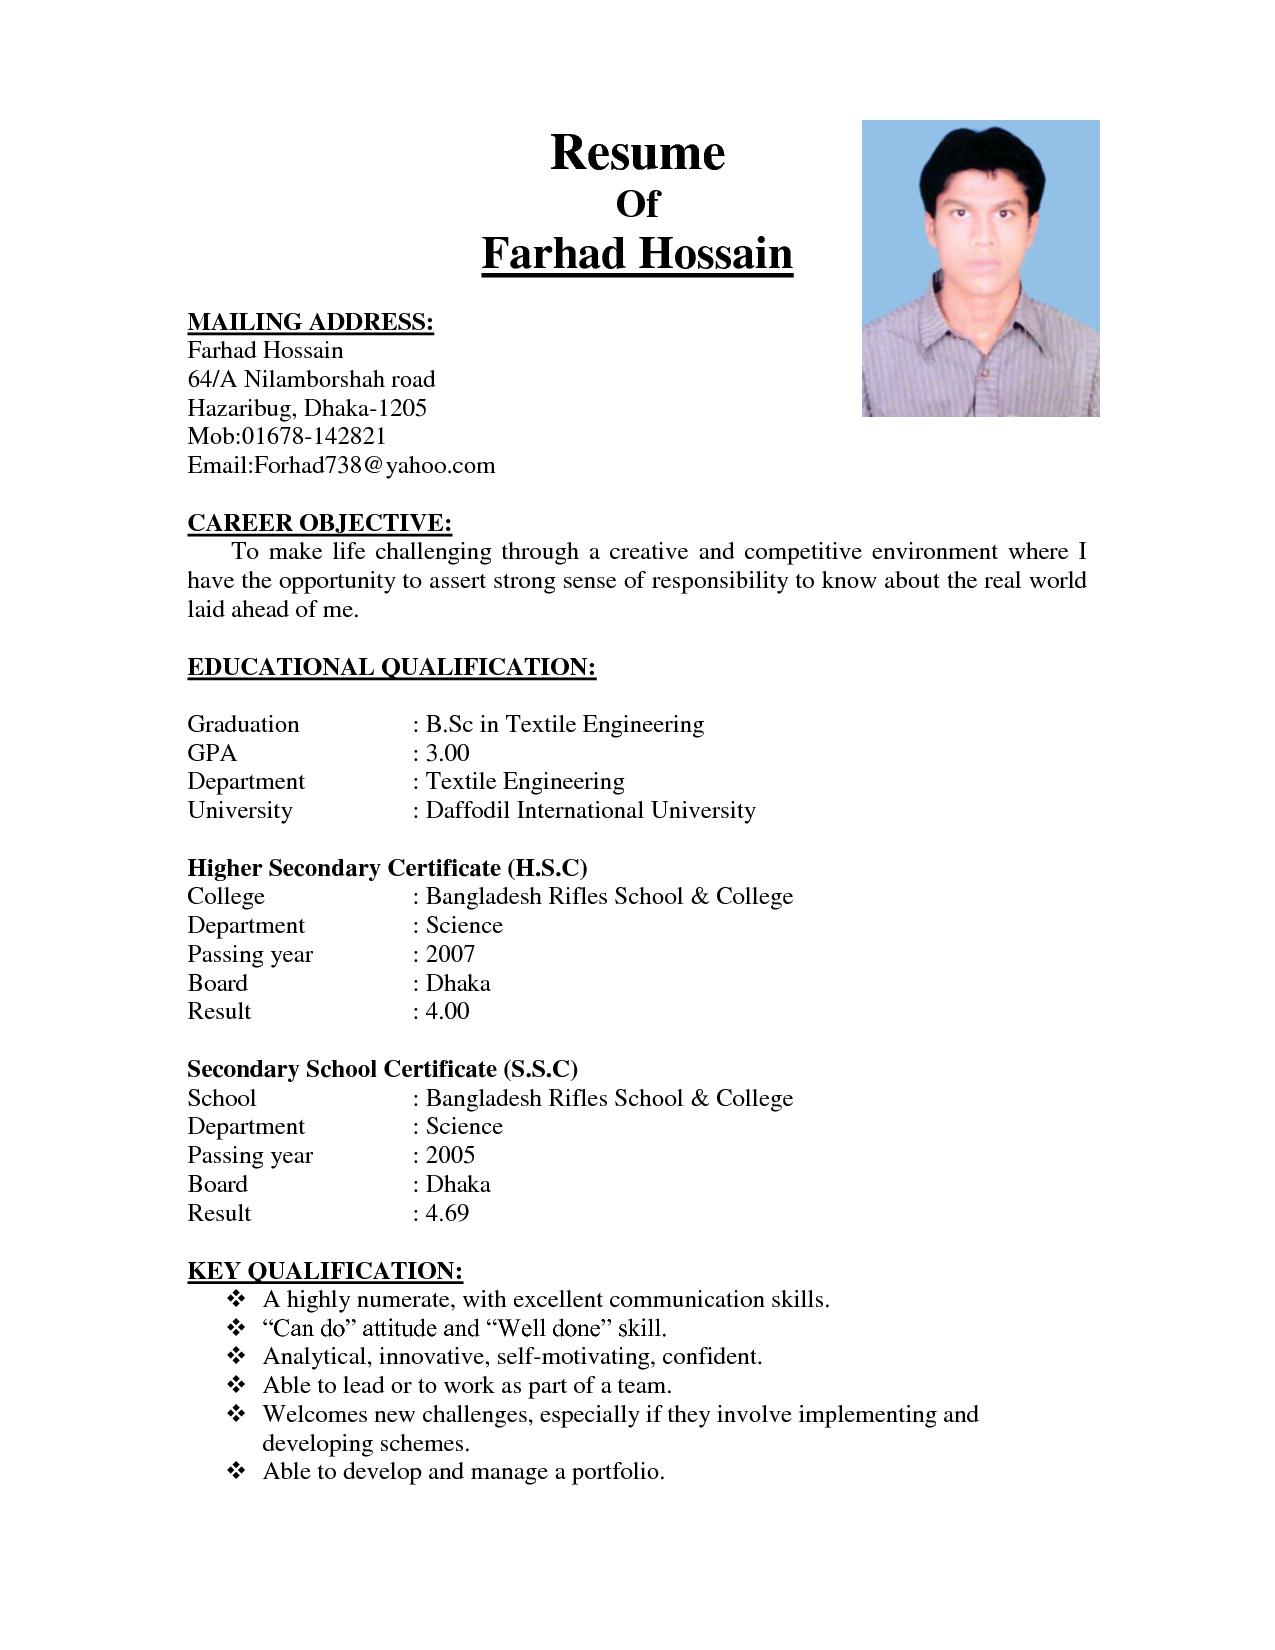 Cv Template Bangladesh Cv format, Resume format download